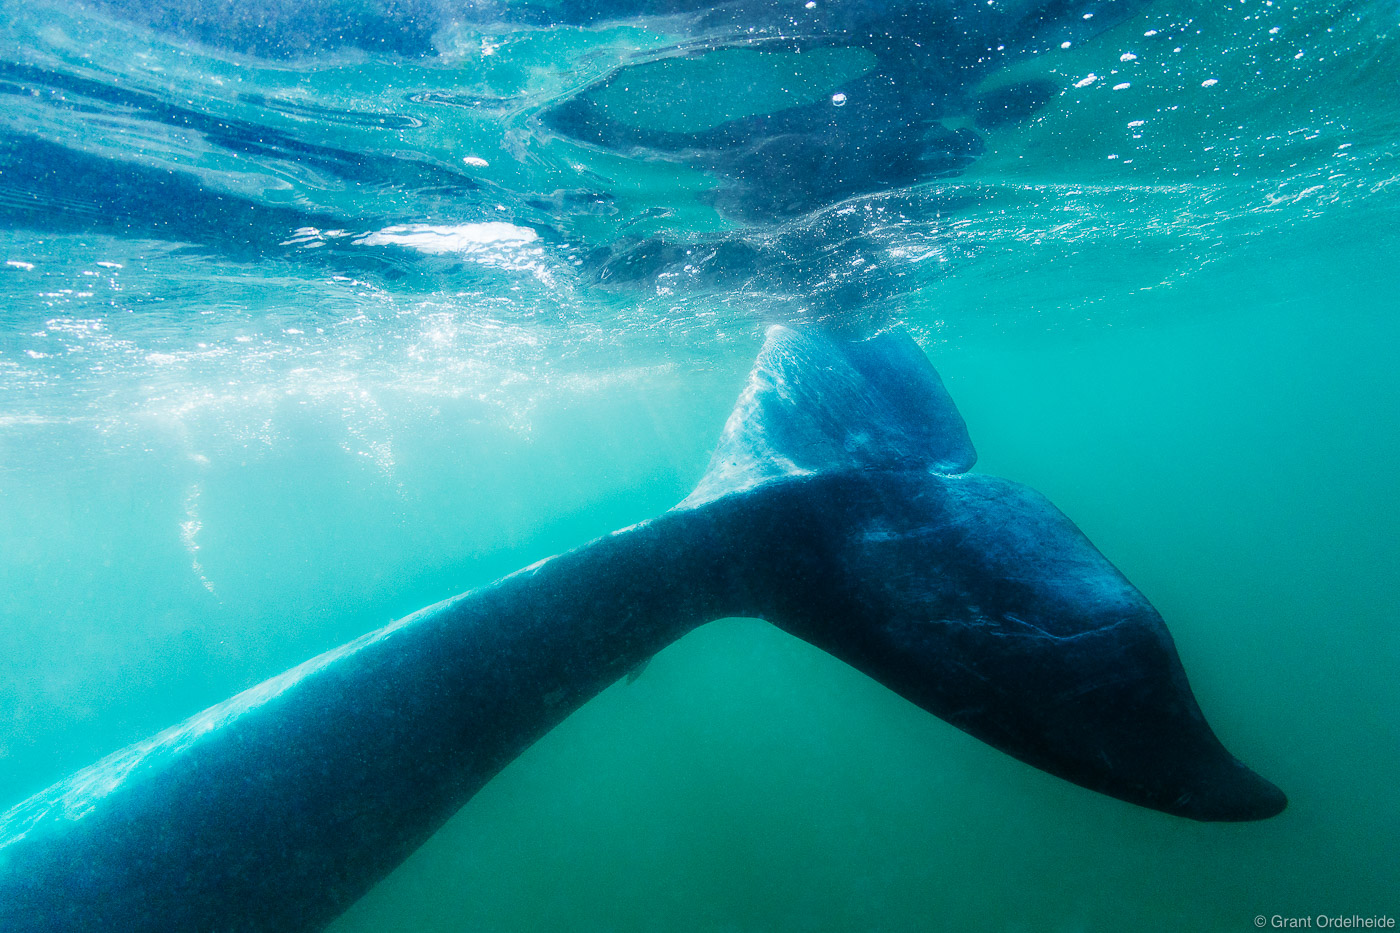 A gray whale  (Eschrichtius robustus) fluke underwater in Mexico's San Ignacio Lagoon